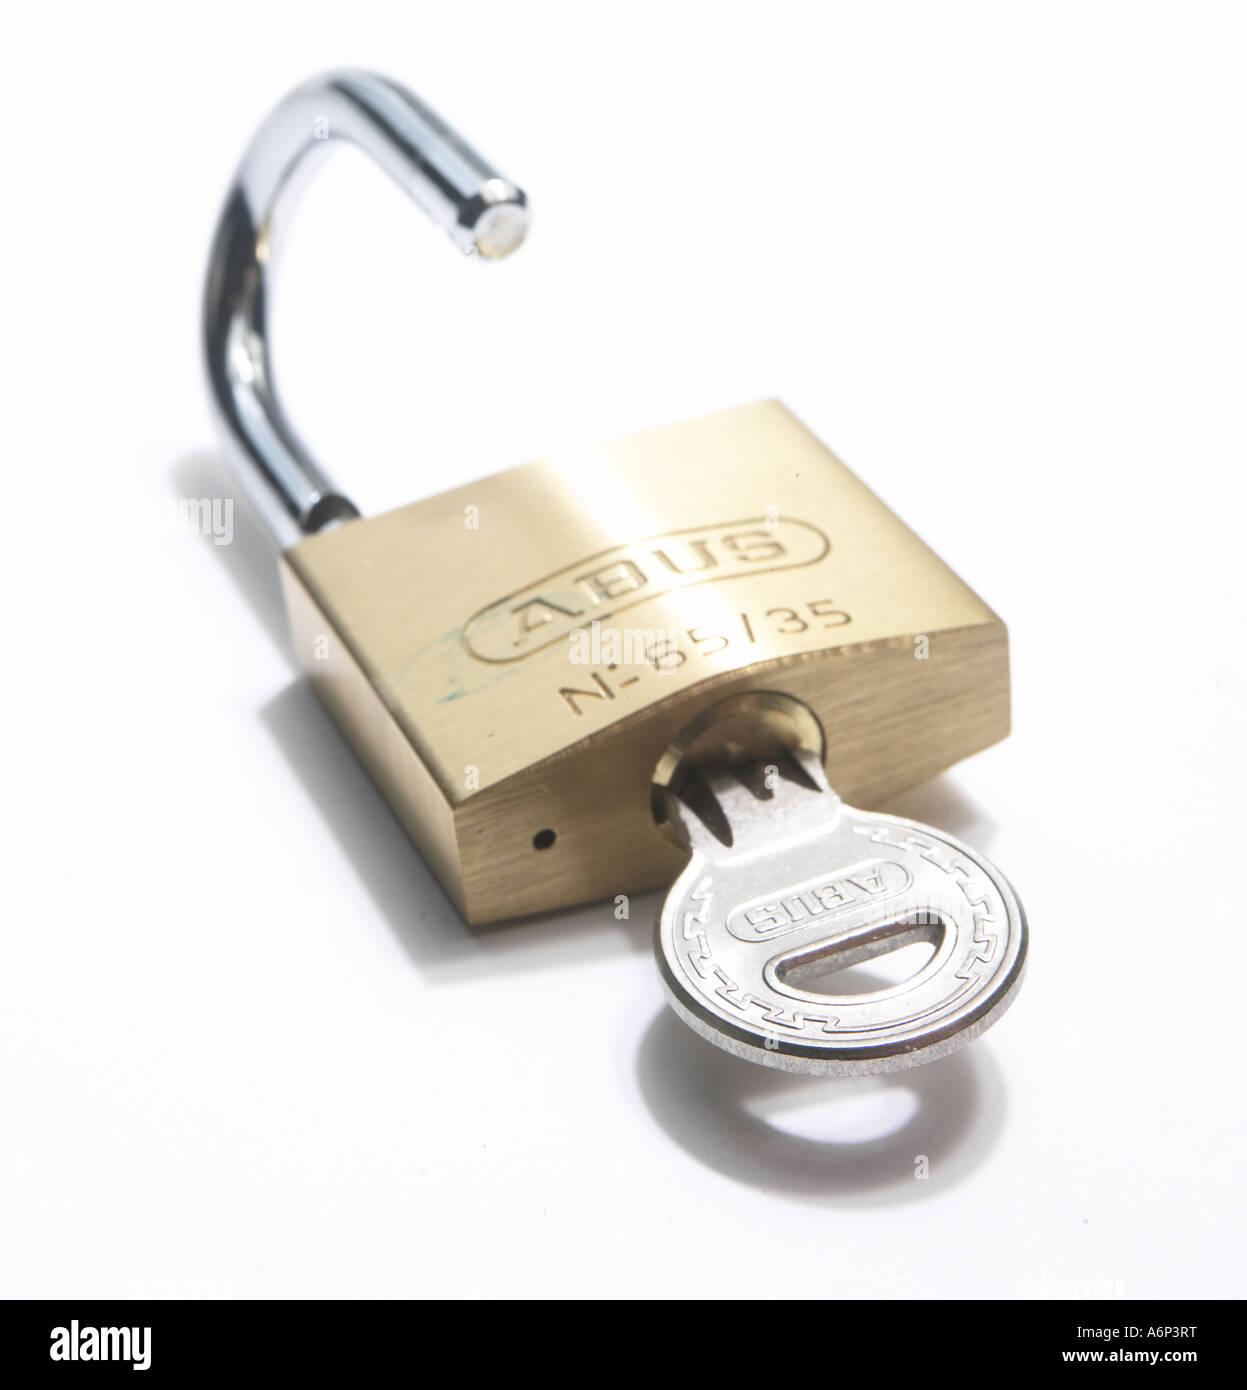 padlock unlocked by key - Stock Image